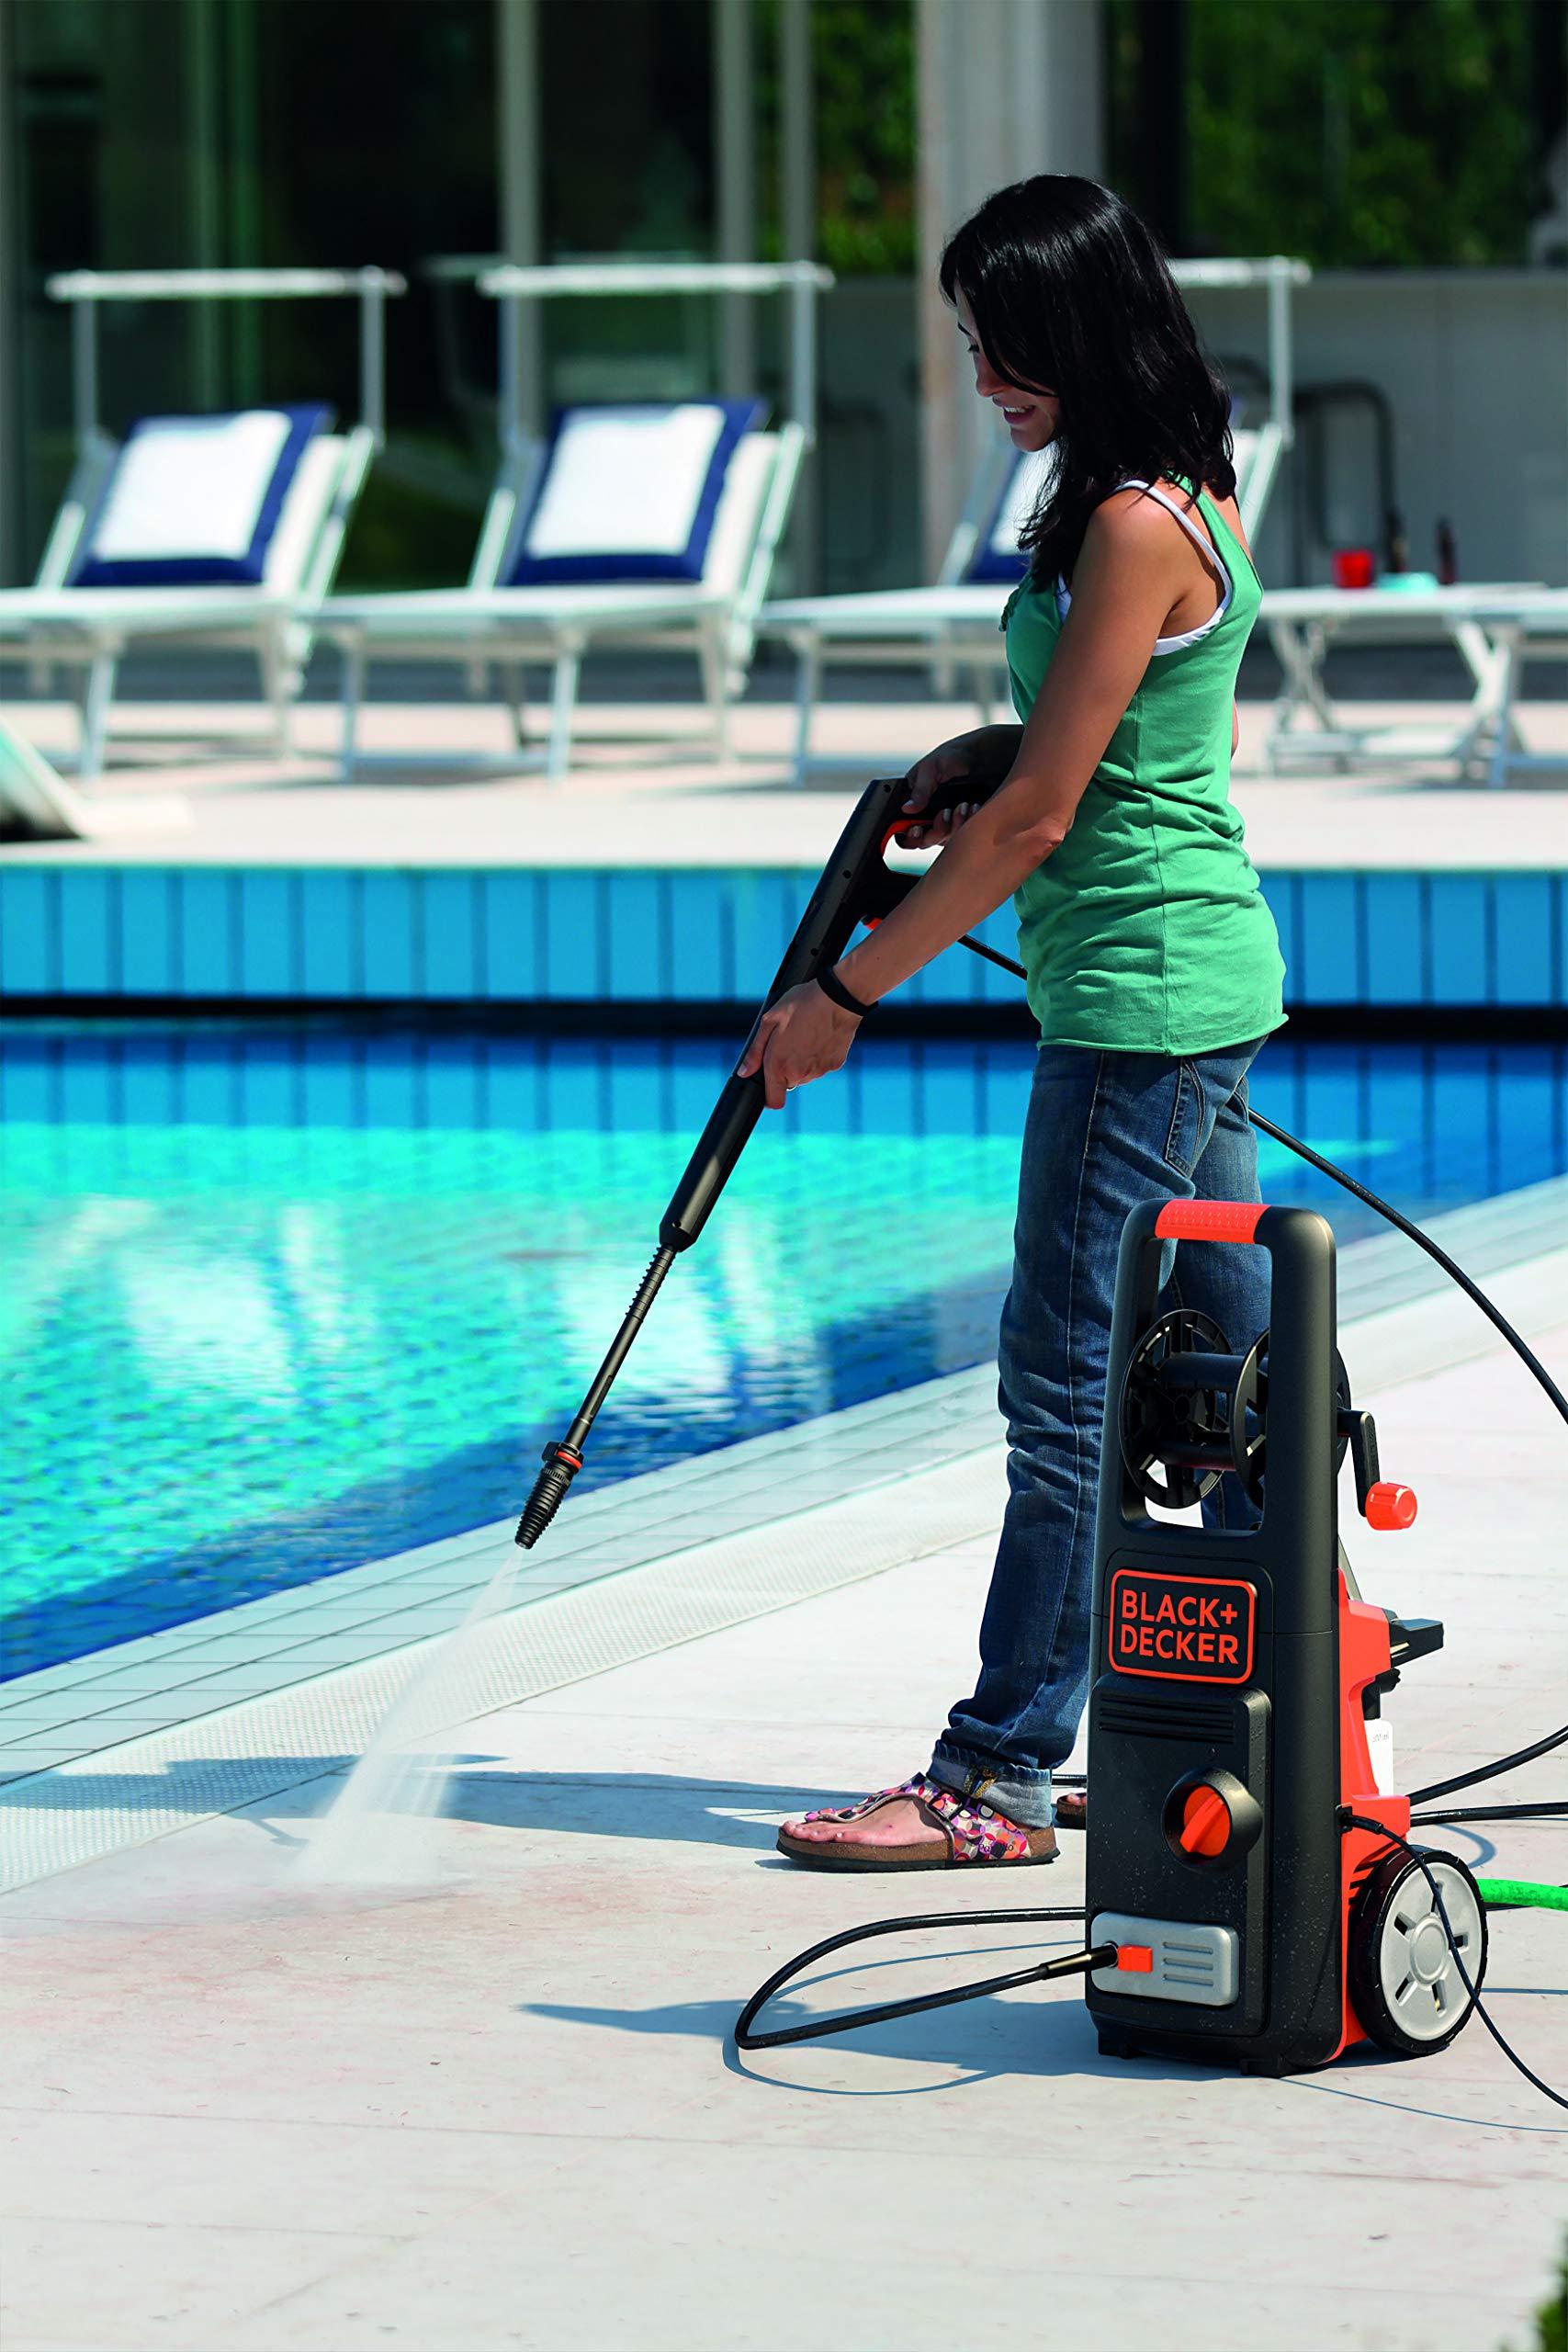 Black+Decker 1800W 135 Bar Pressure Washer Cleaner for Home, Garden and Vehicles, Black/Orange - BXPW1800E-B5, 2 Years Warranty